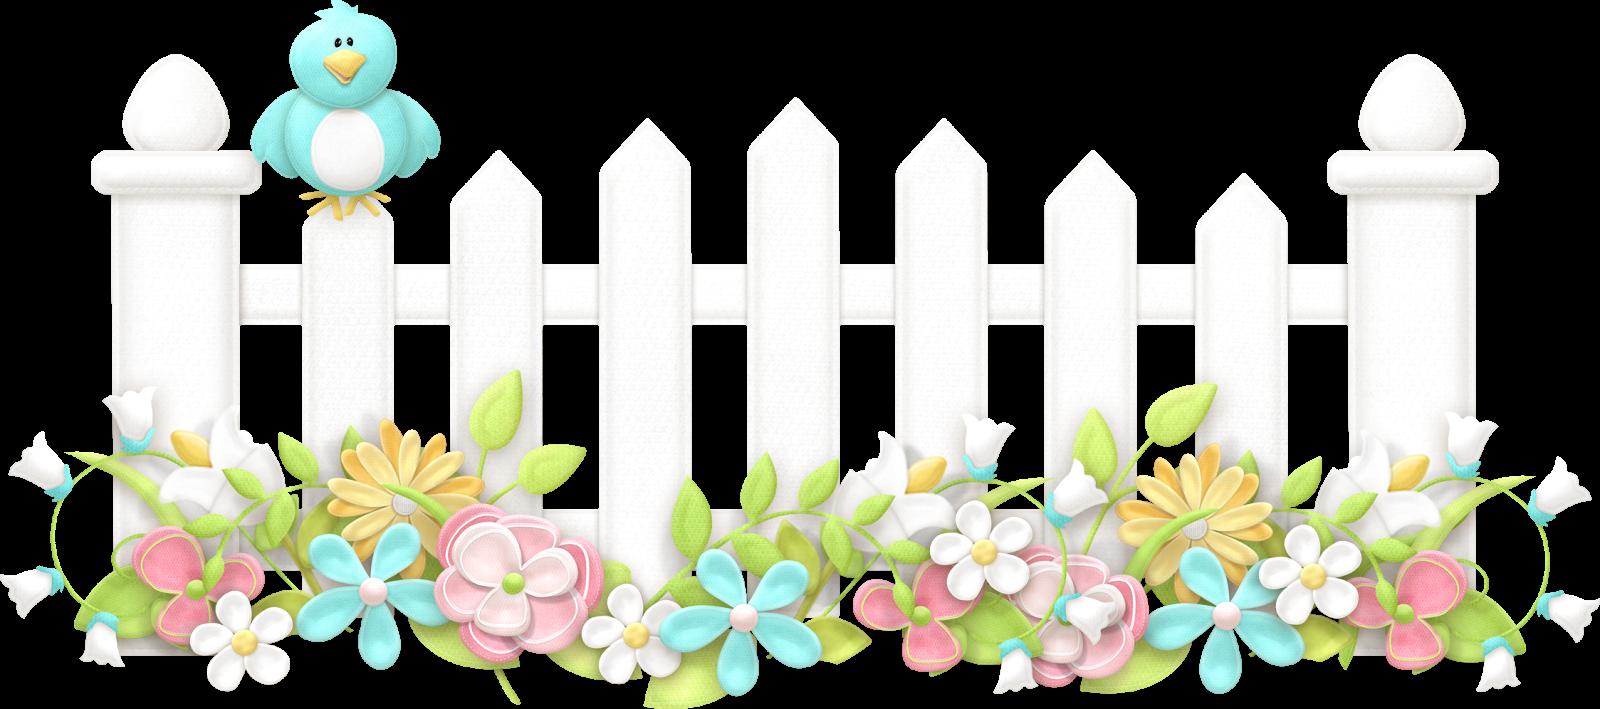 Primaverababies clipart picture transparent Nest clipart baby floral, Nest baby floral Transparent FREE ... picture transparent